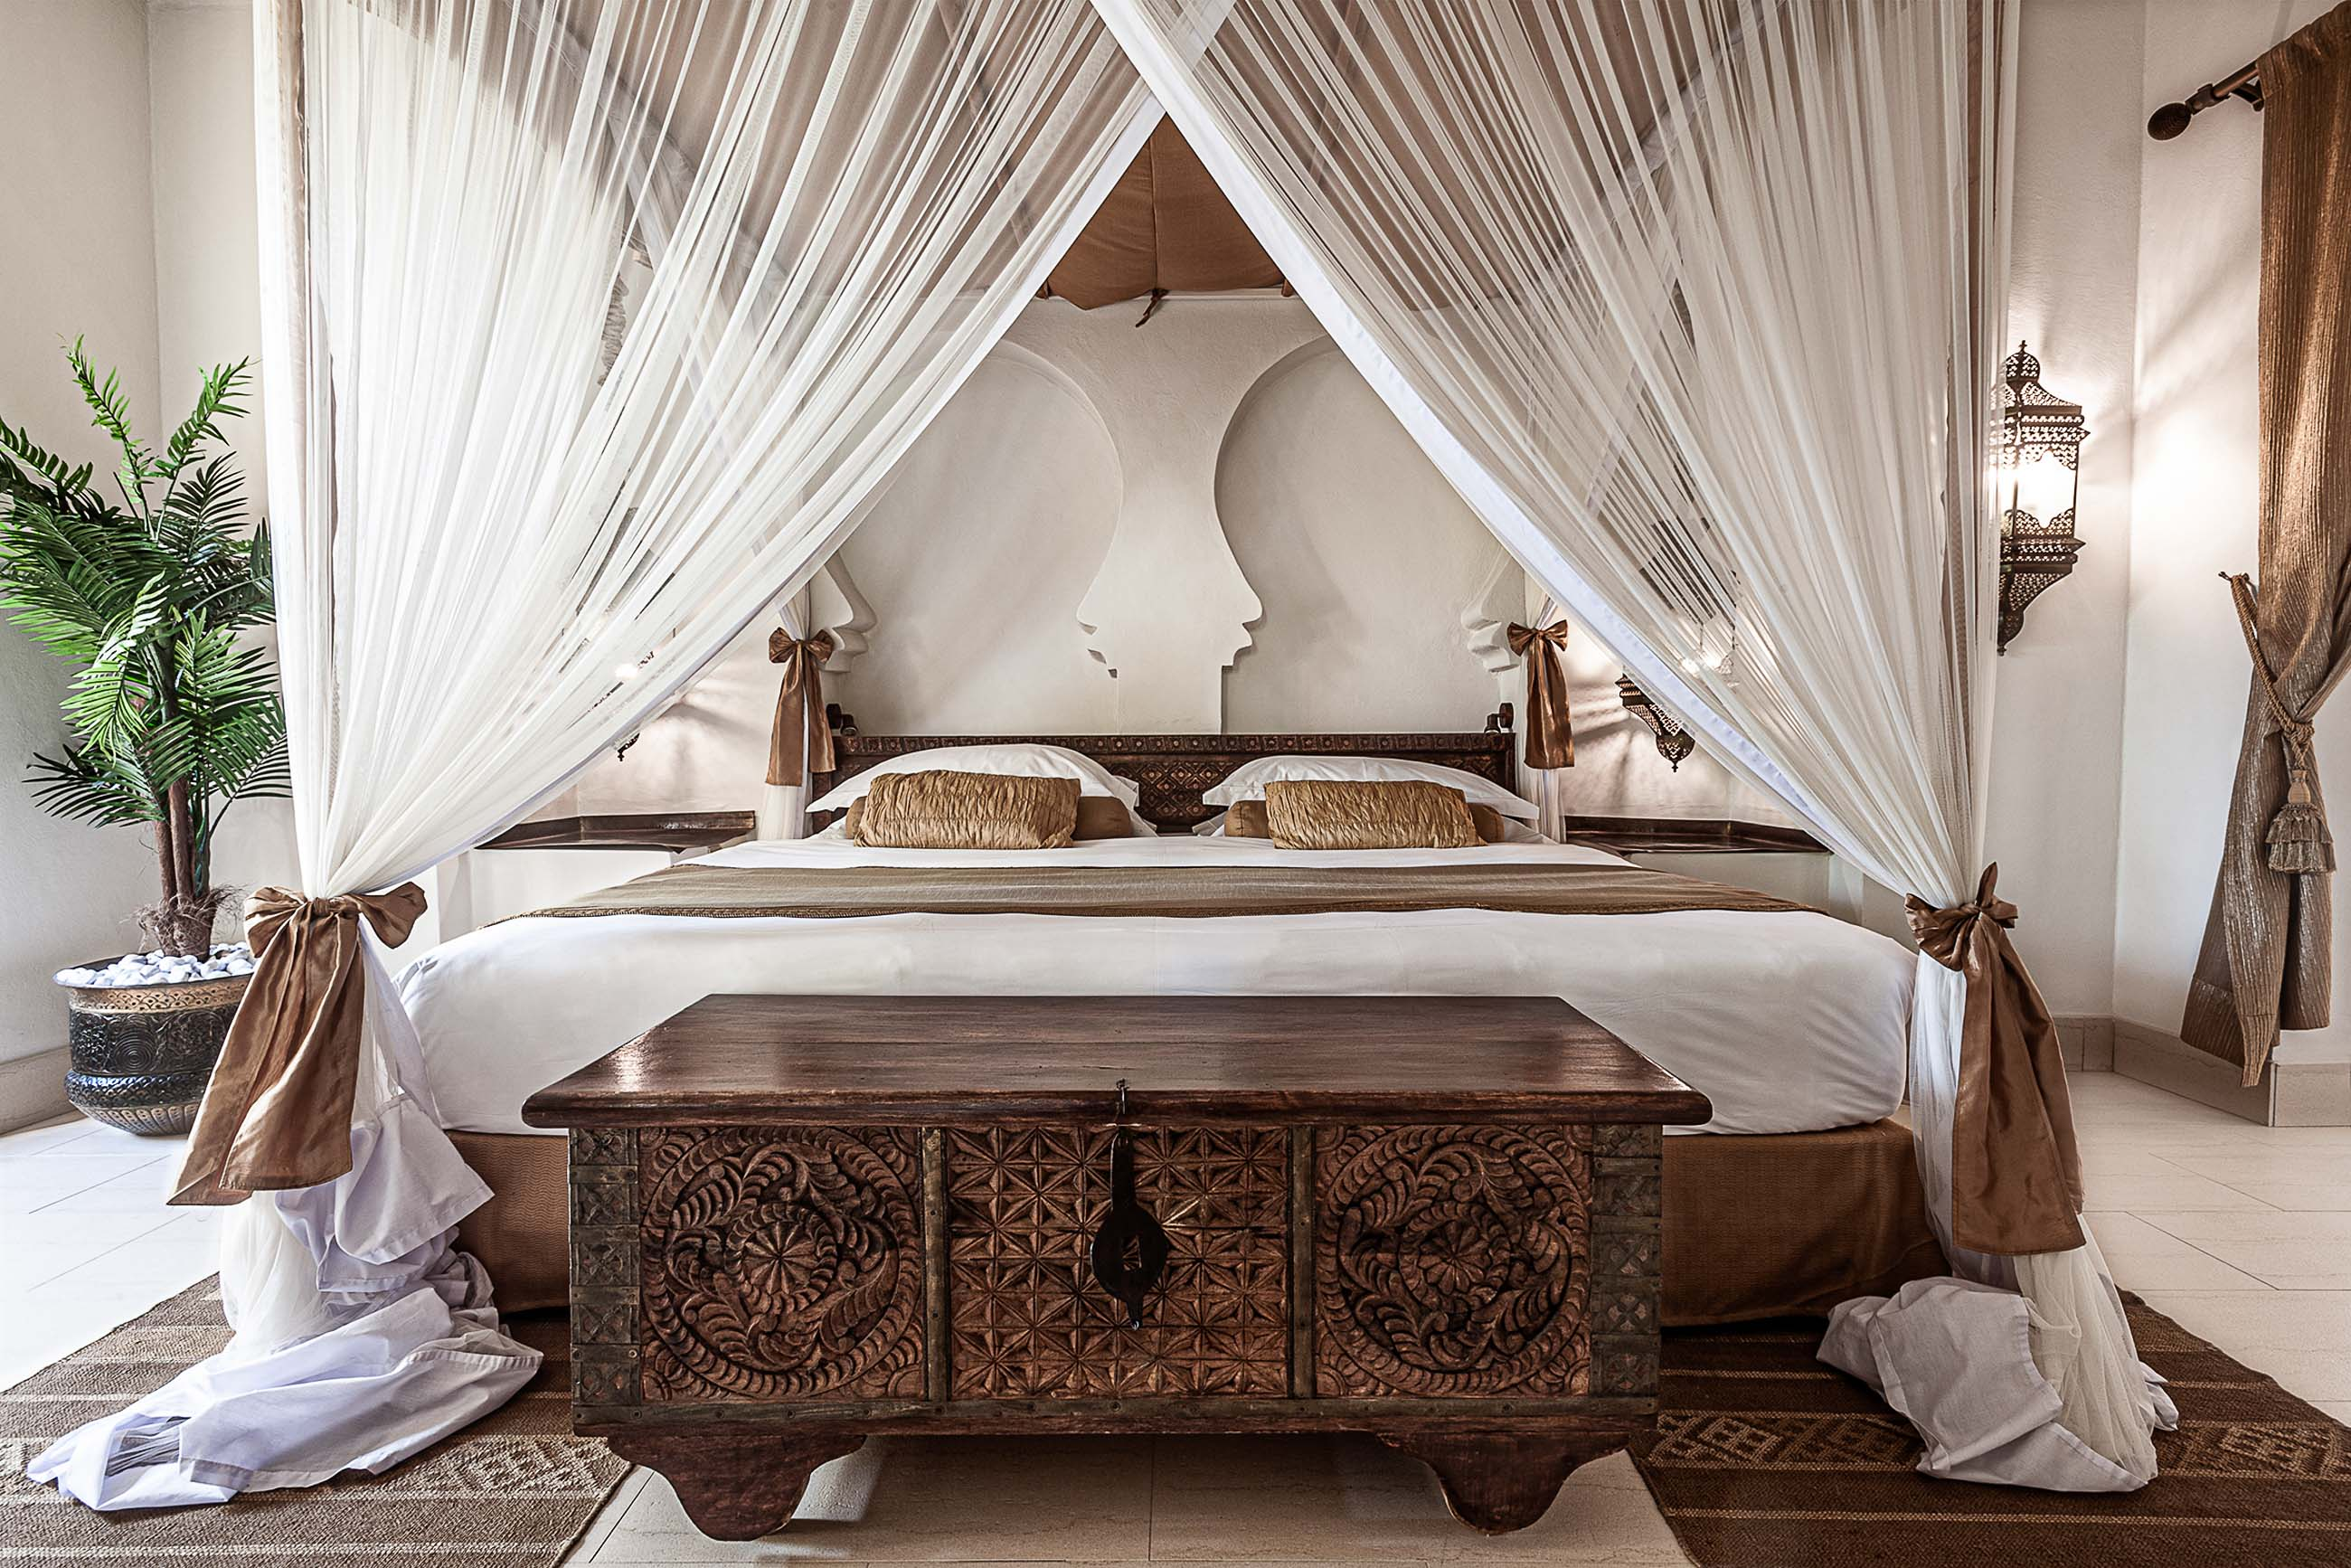 https://bubo.sk/uploads/galleries/19778/baraza-one-bedroom-villa-2.jpg